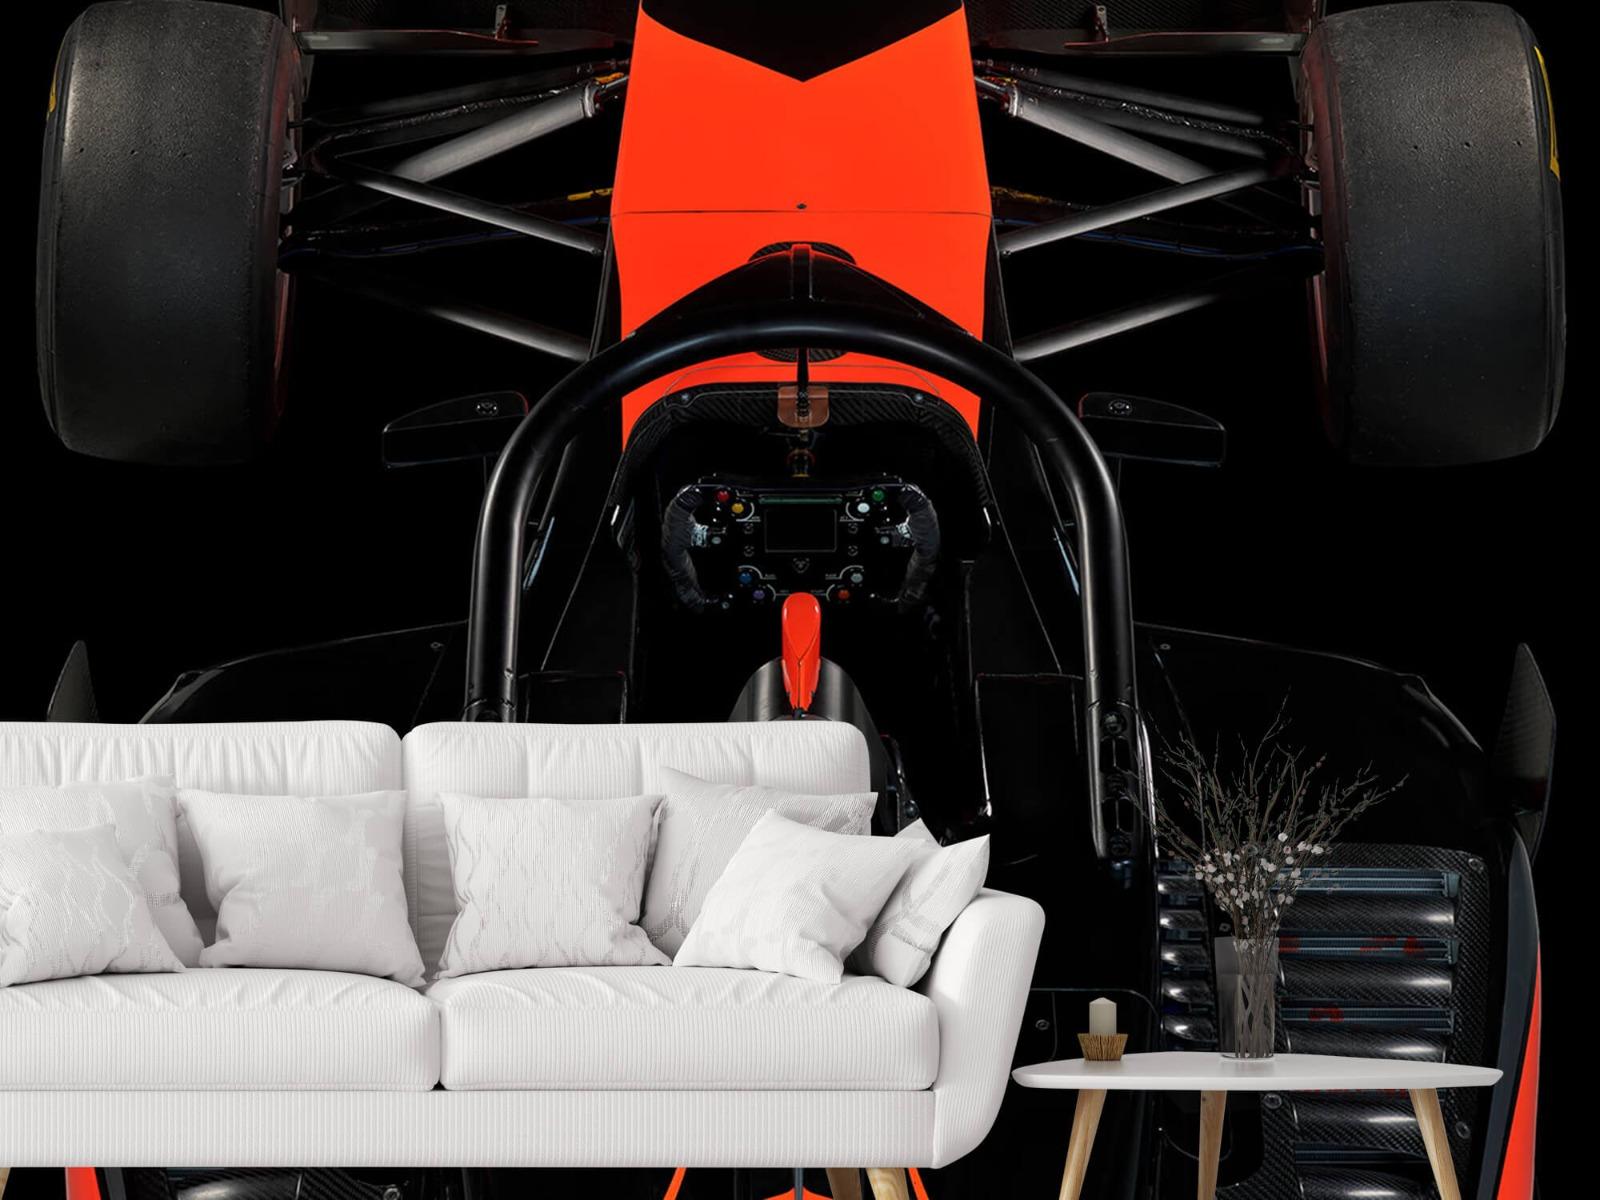 Sportauto's - Formule 3 - Cockpit view - dark - Tienerkamer 3